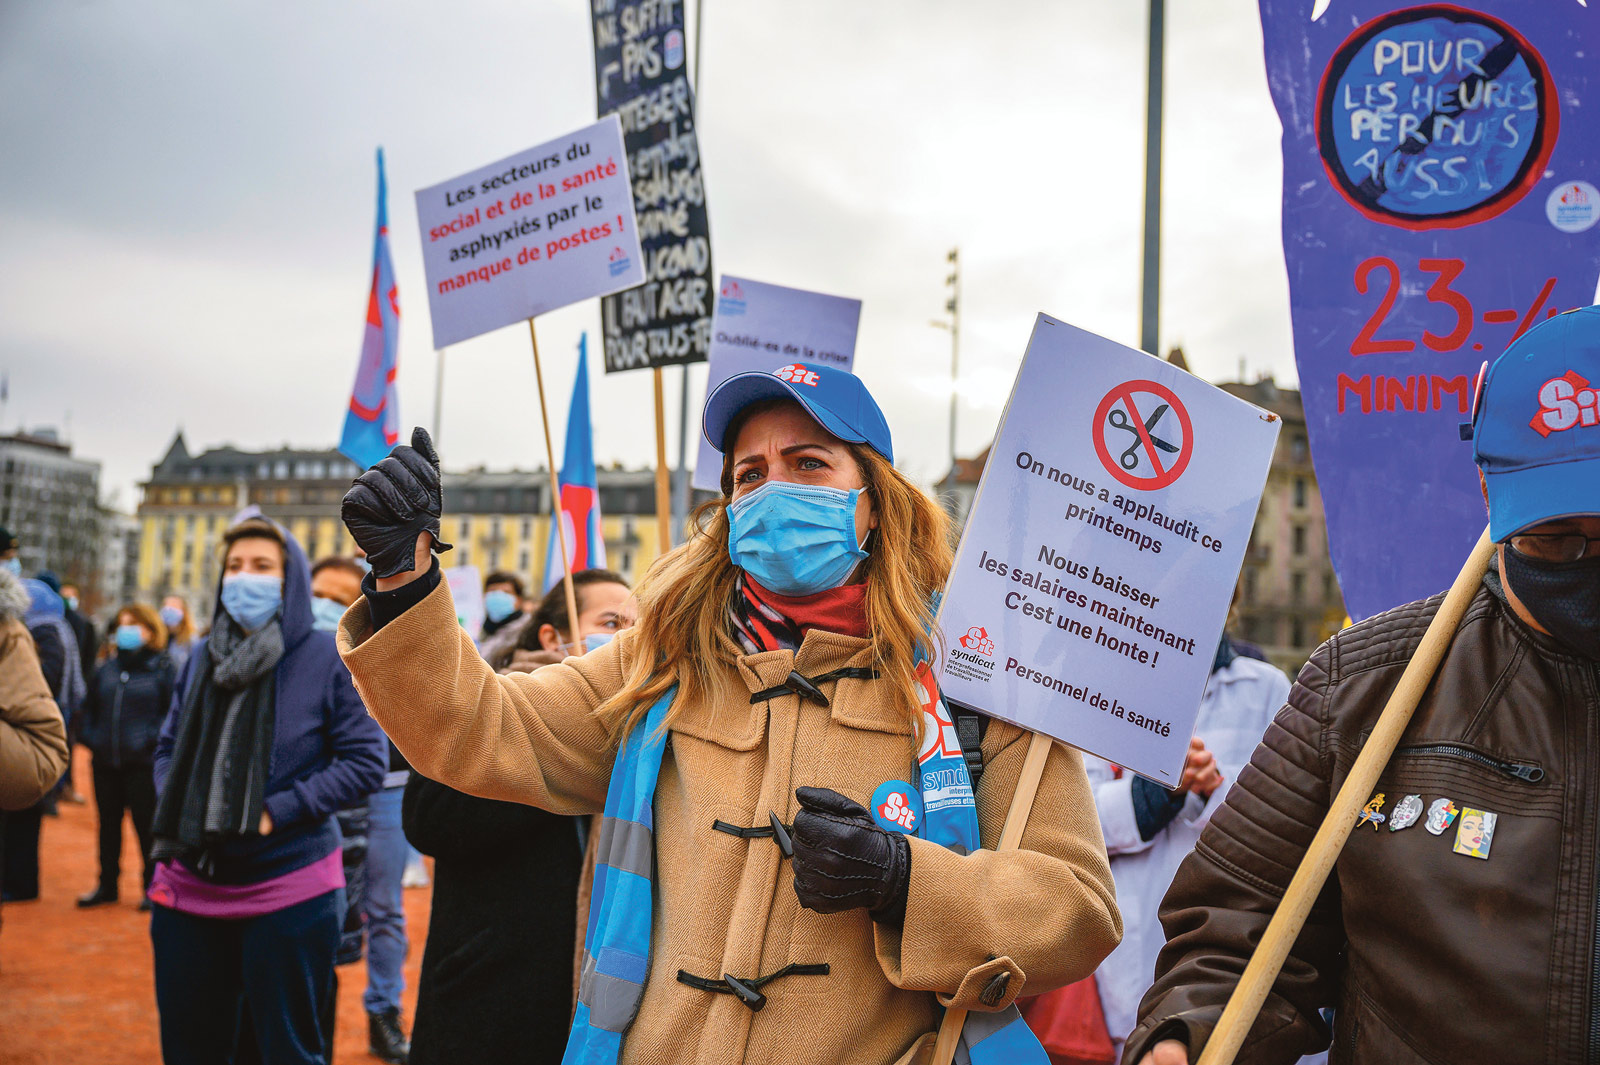 Manifestation sortie de crise geneve decembre 2020_Eric roset